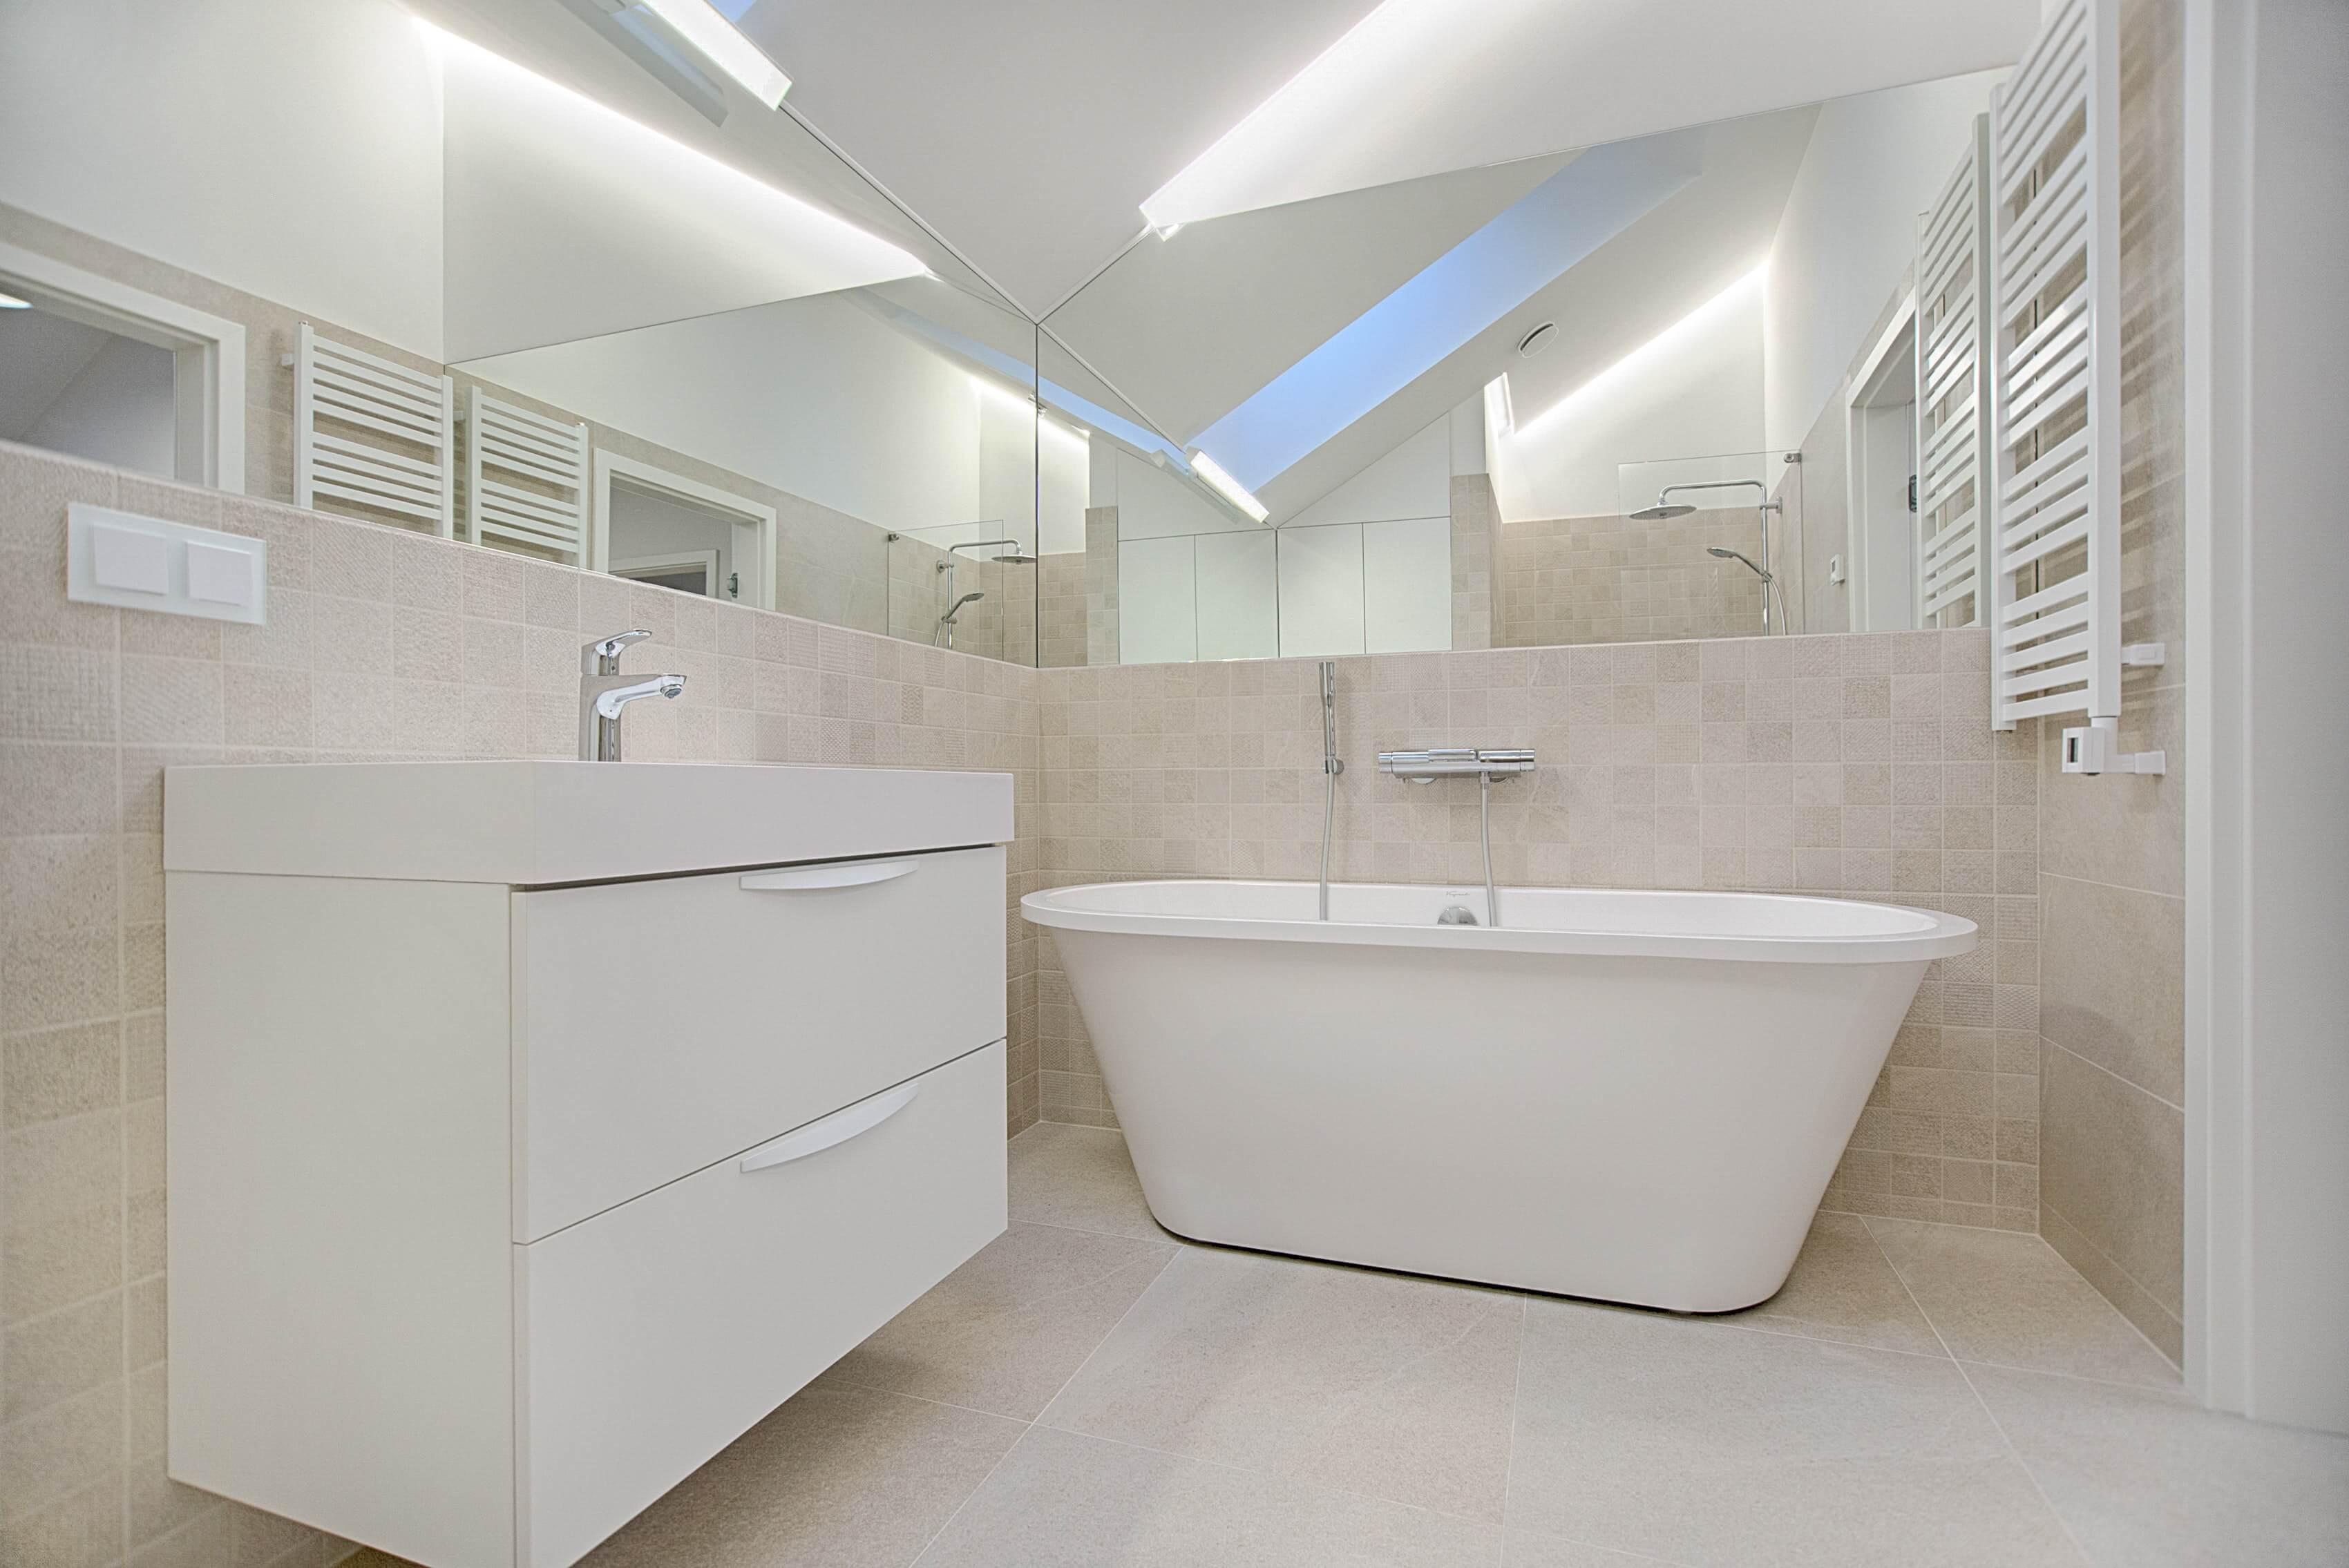 How to Vent a Bathroom Fan through Soffit – Interior Design